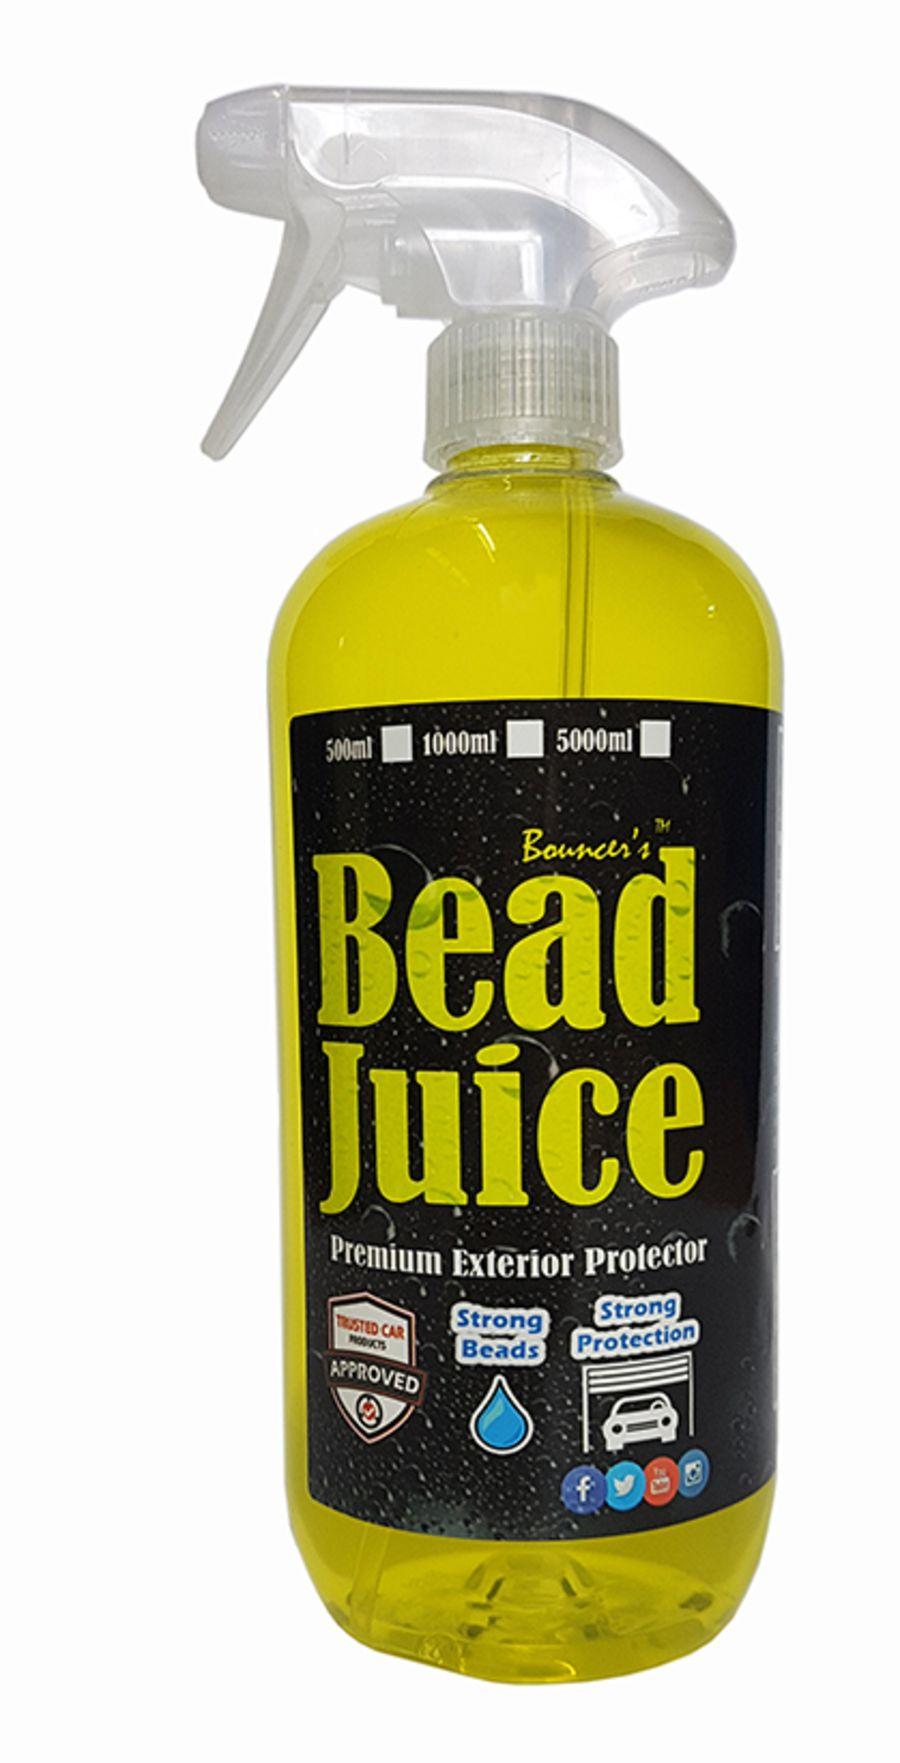 Bouncer's Bead Juice 1000ml